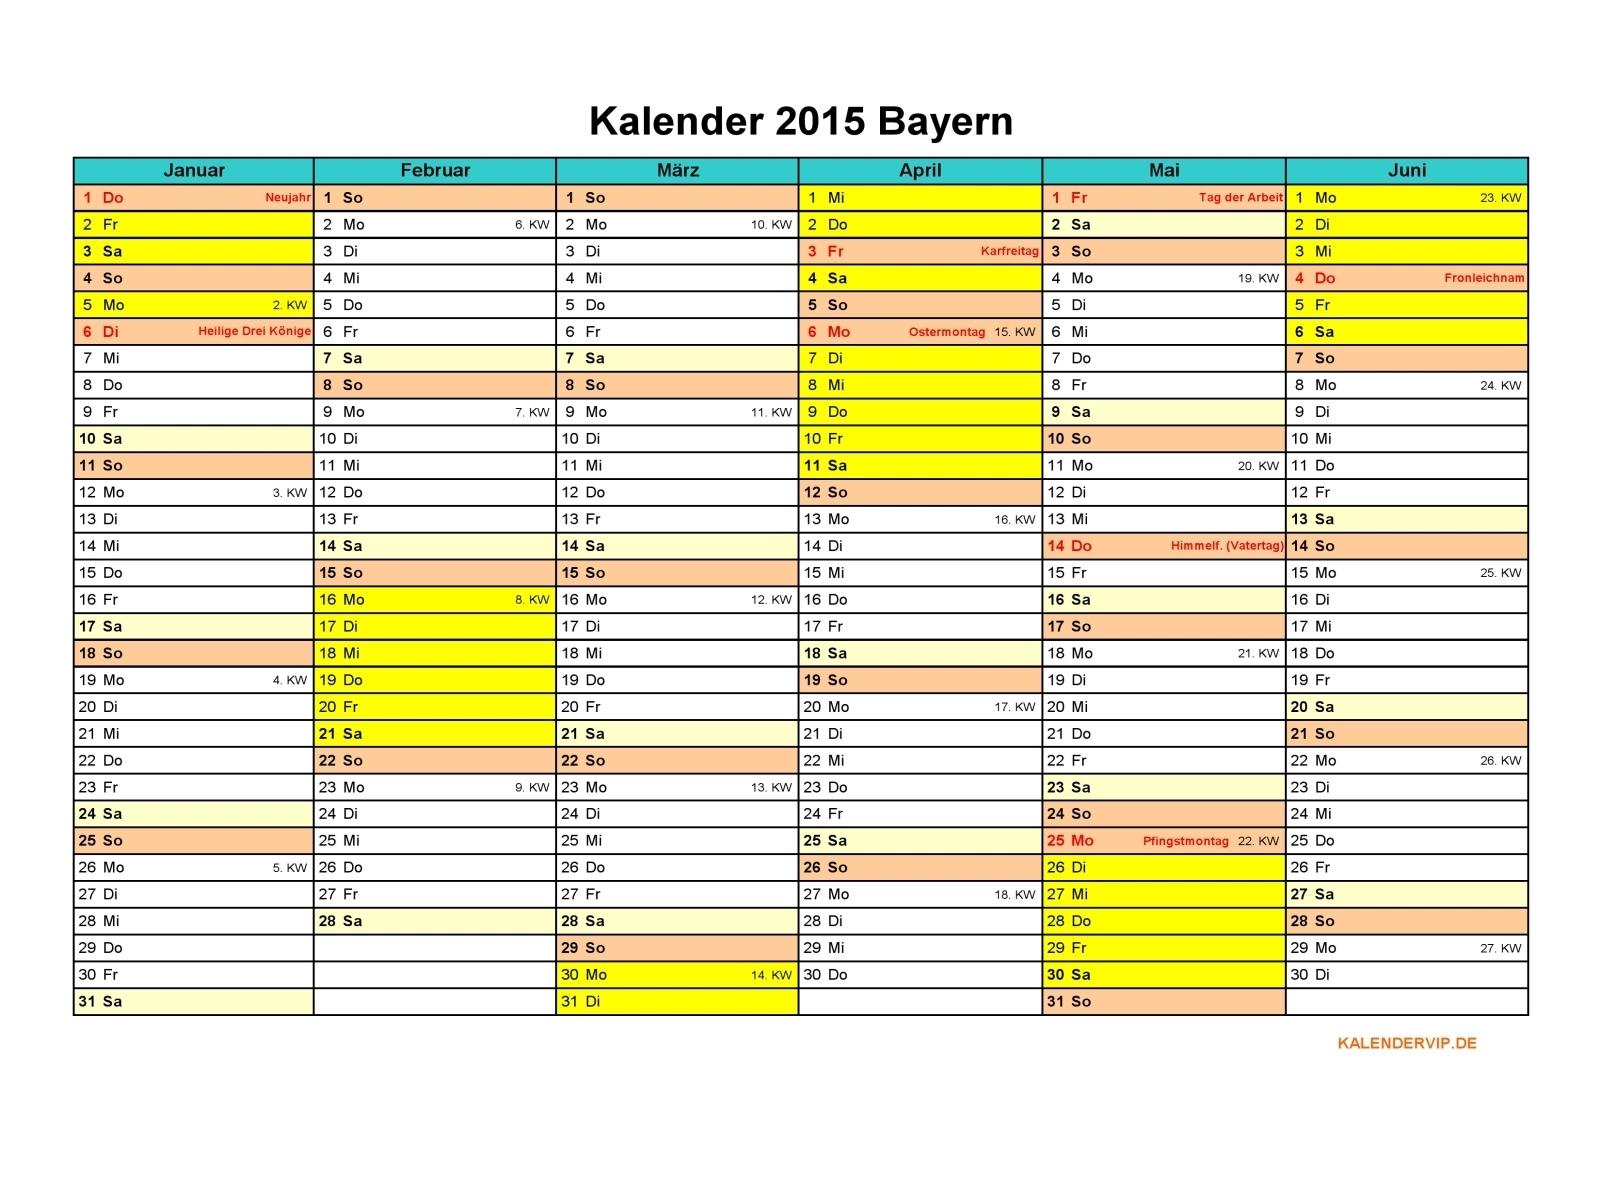 Kalender 2015 Bayern - KalenderVIP